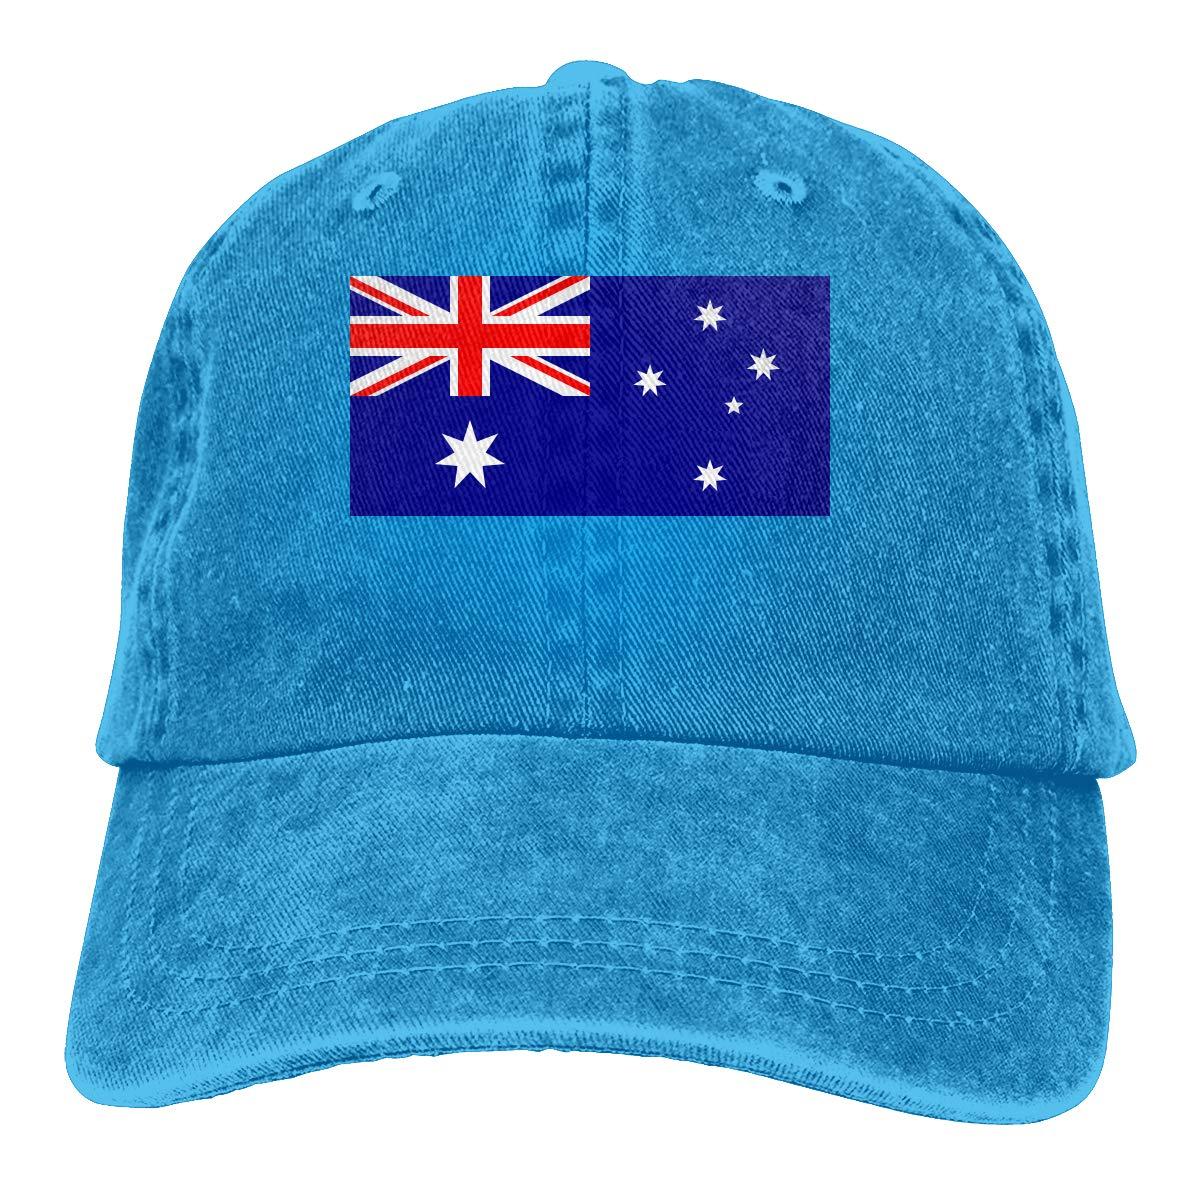 Australia Flag Unisex Trendy Denim Sun Hat Adjustable Baseball Cap